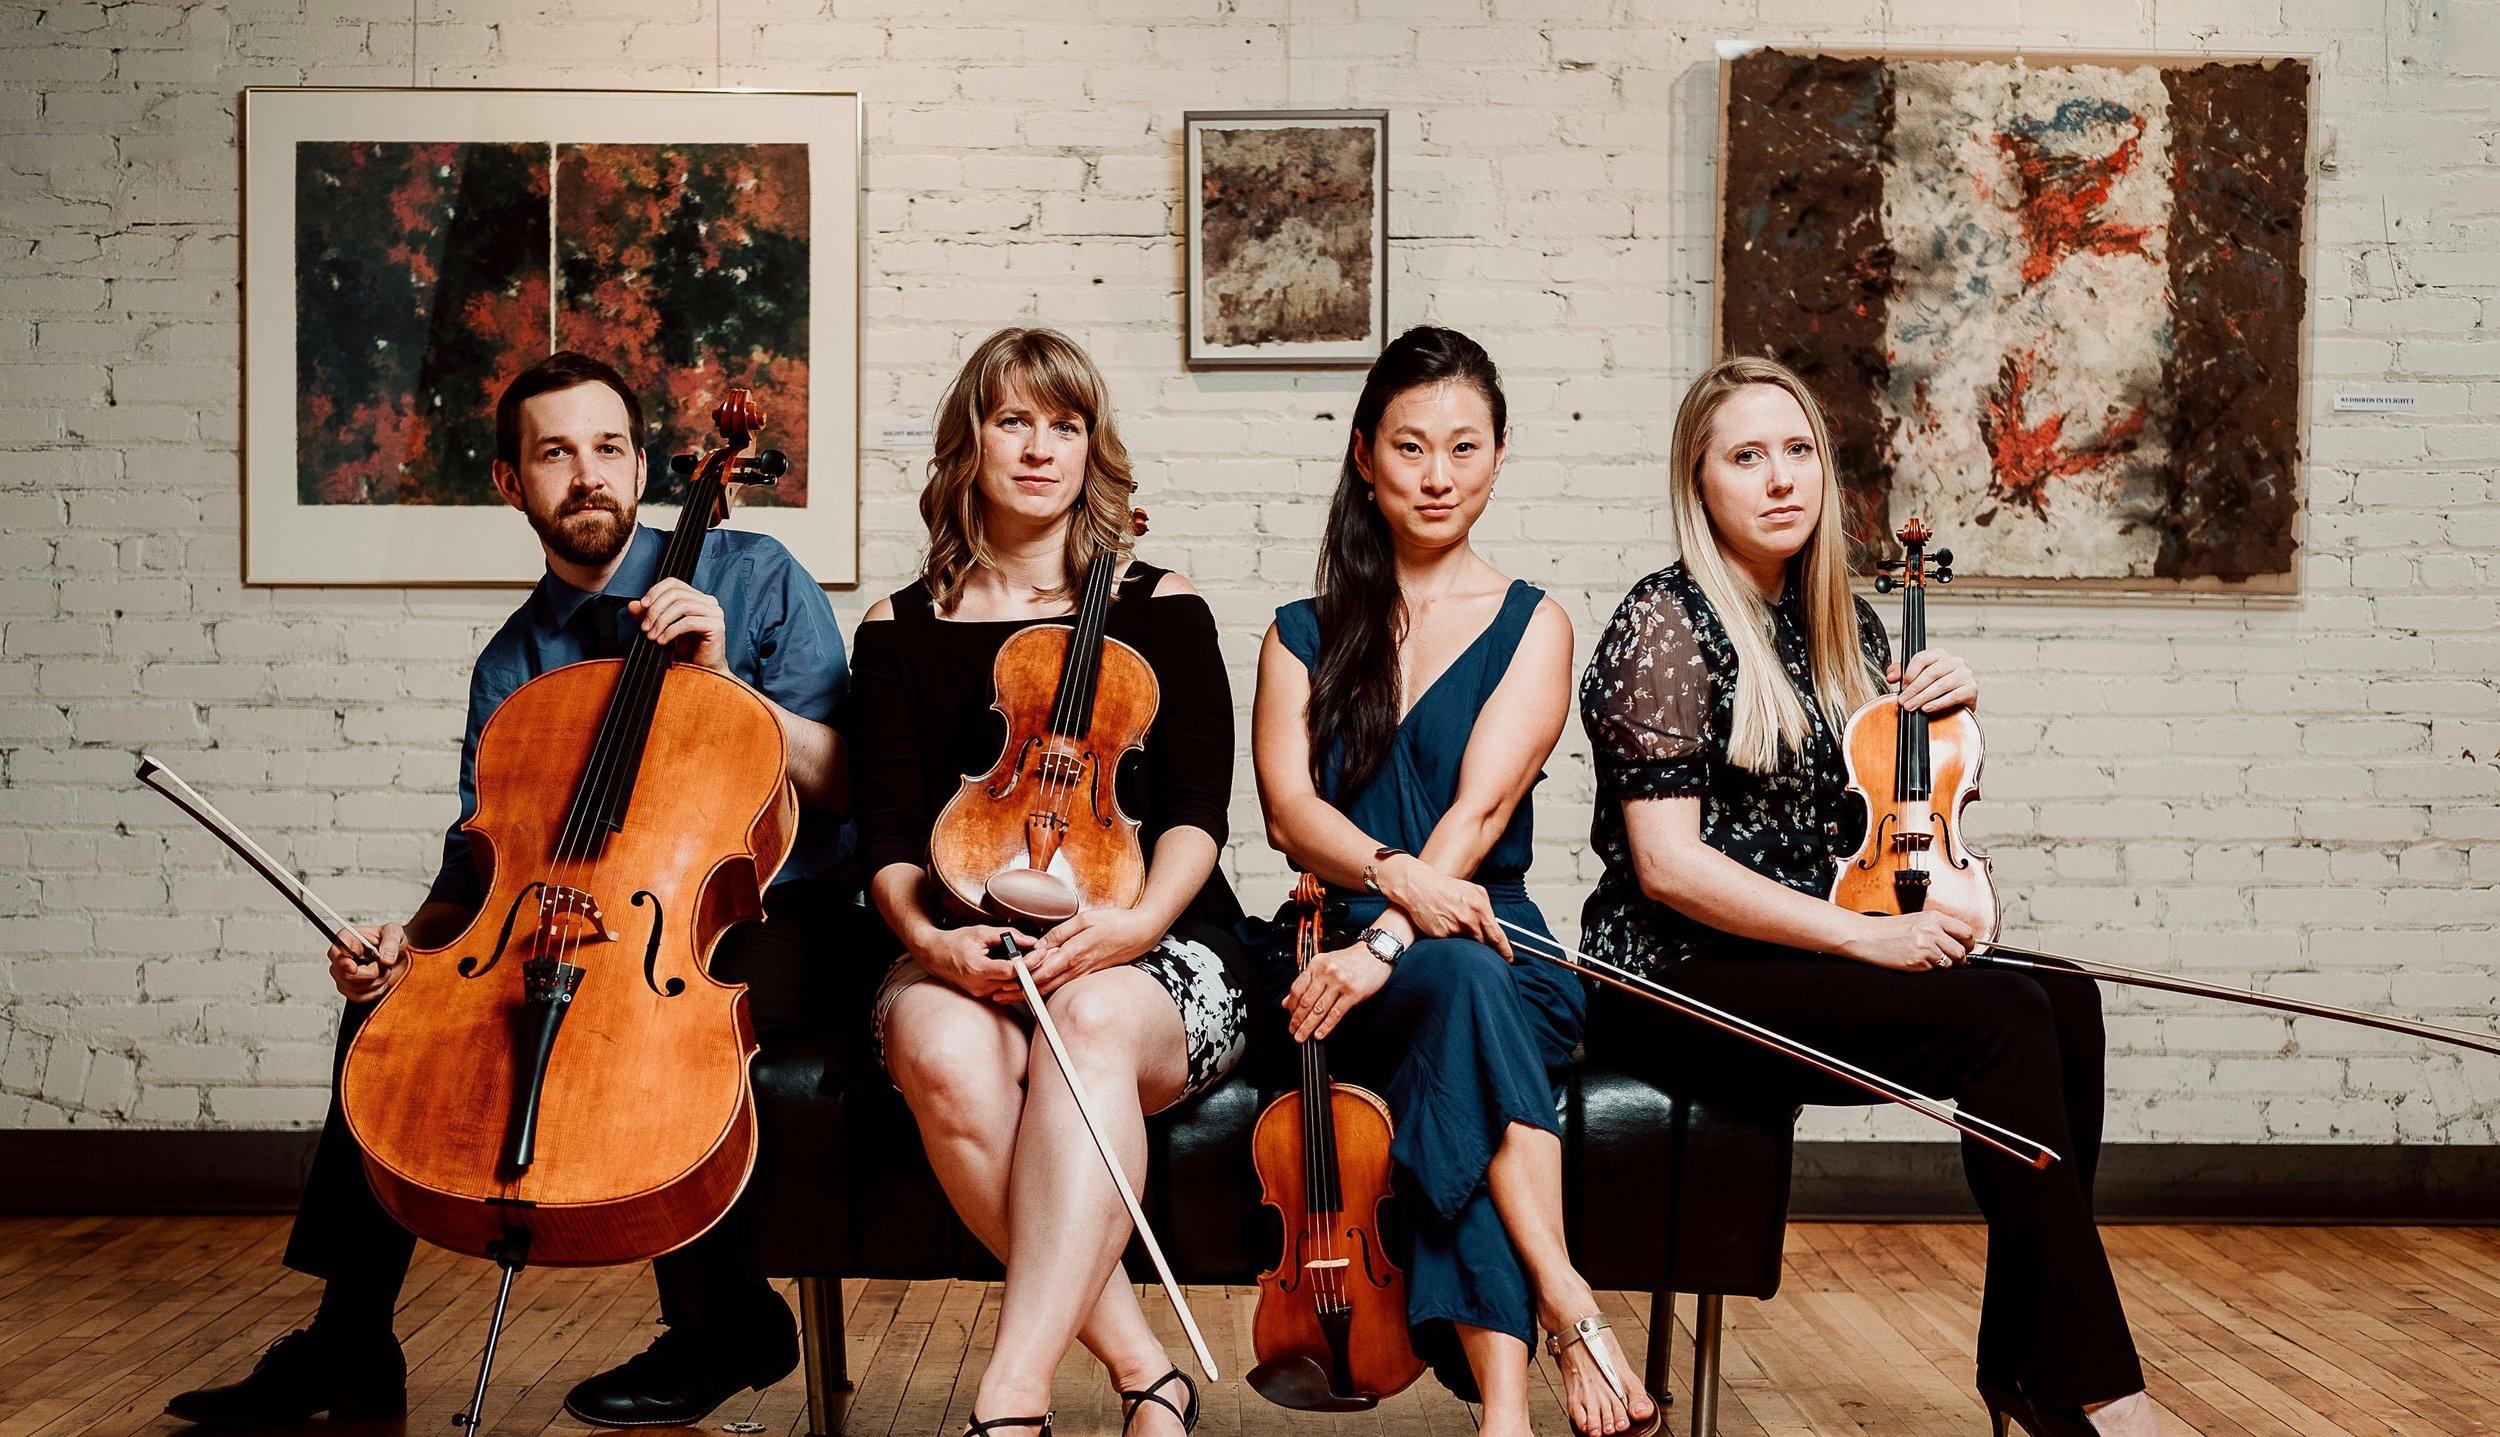 Lux String Quartet  (Thursday Musical Debut)   Eric Graf, cello; Kirsti Petraborg, viola; Erika Blanco, violin; Stephanie Skor, violin